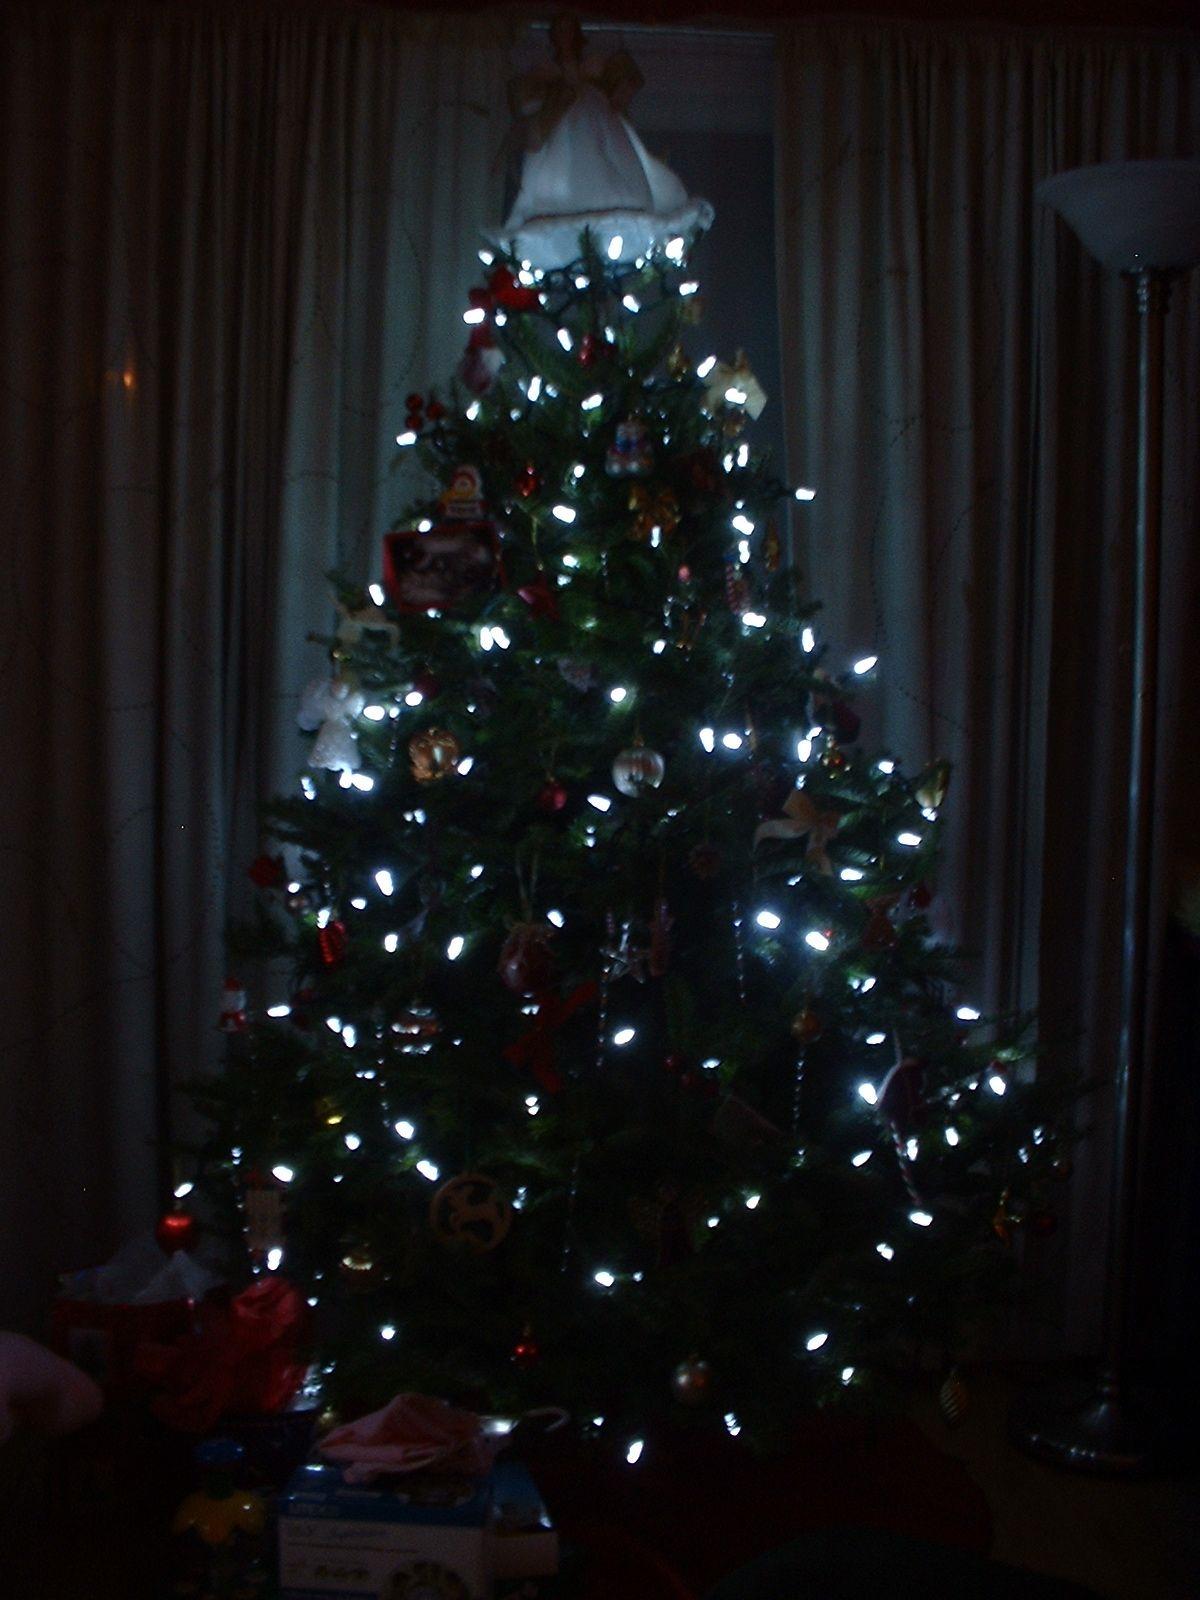 led christmas l - Google Search | xmas | Pinterest | Christmas tree ...